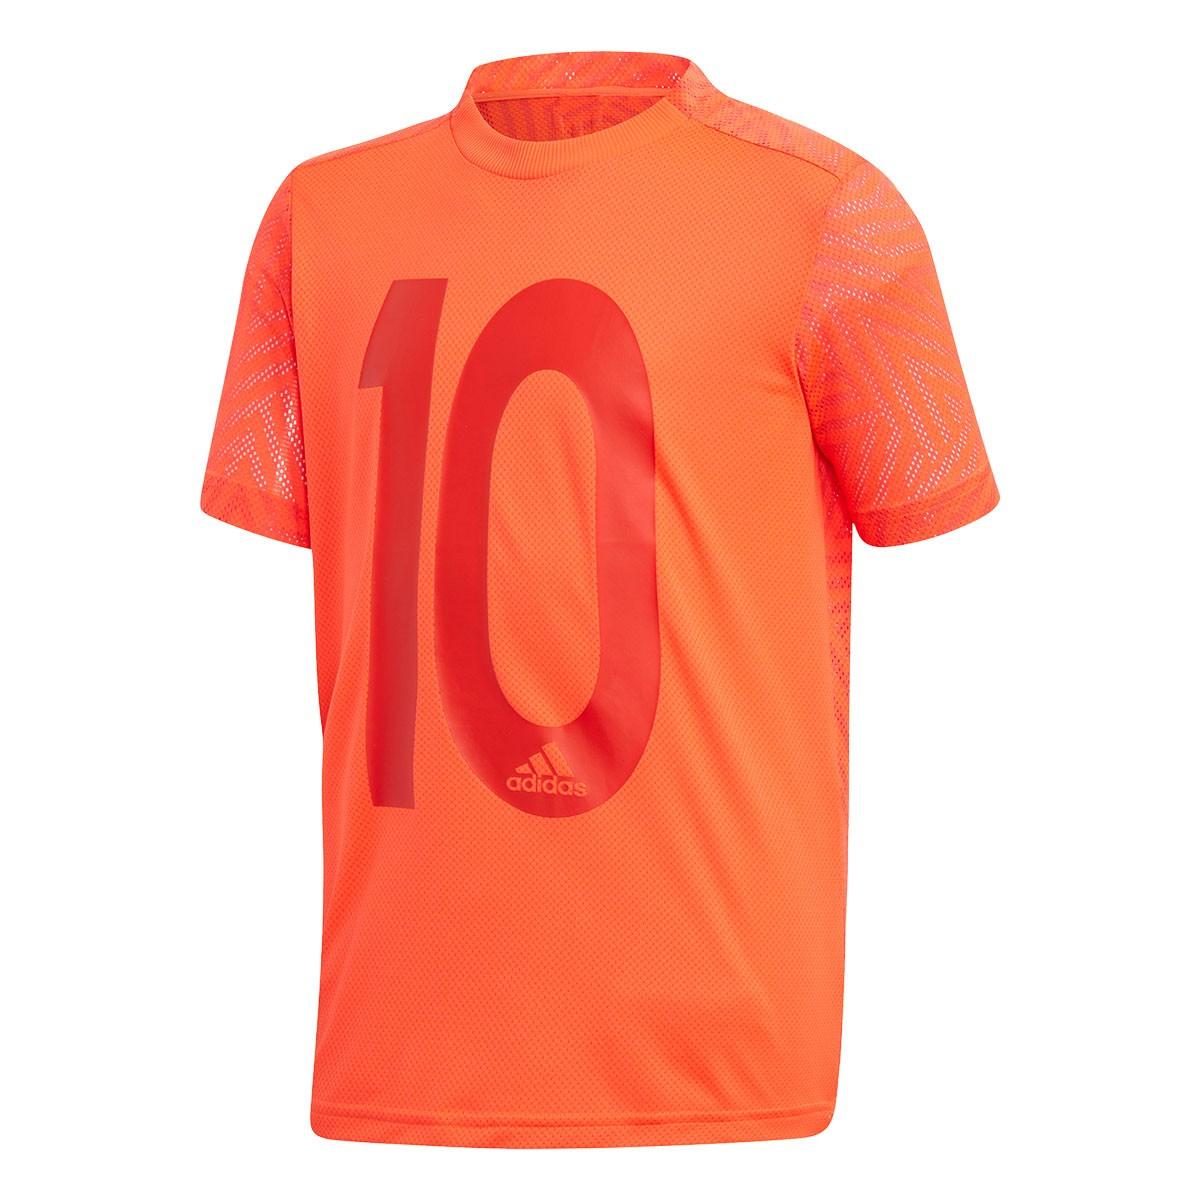 Maillot adidas Messi Icon enfant